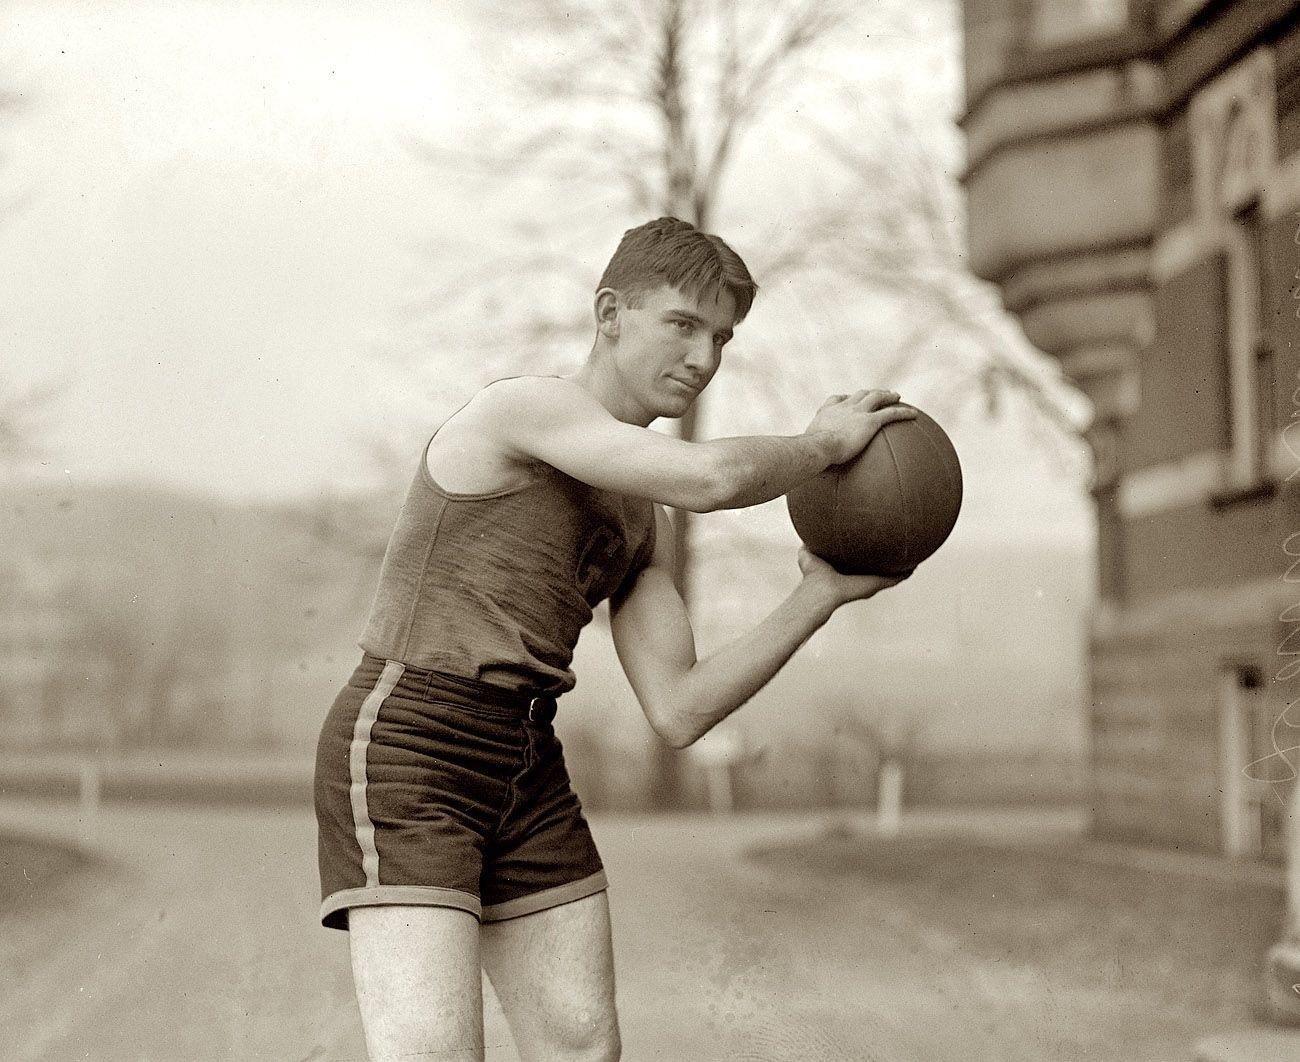 "Washington, D.C. ""Davis, Gallaudet, 1924."" Another Gallaudet University basketball player."